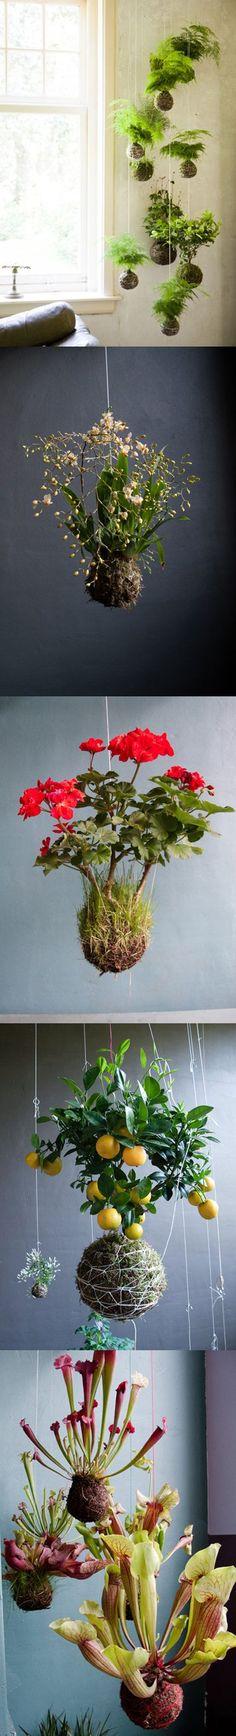 jardim-vertical-suspenso-inverno-ideias-29.jpg (433×3186)